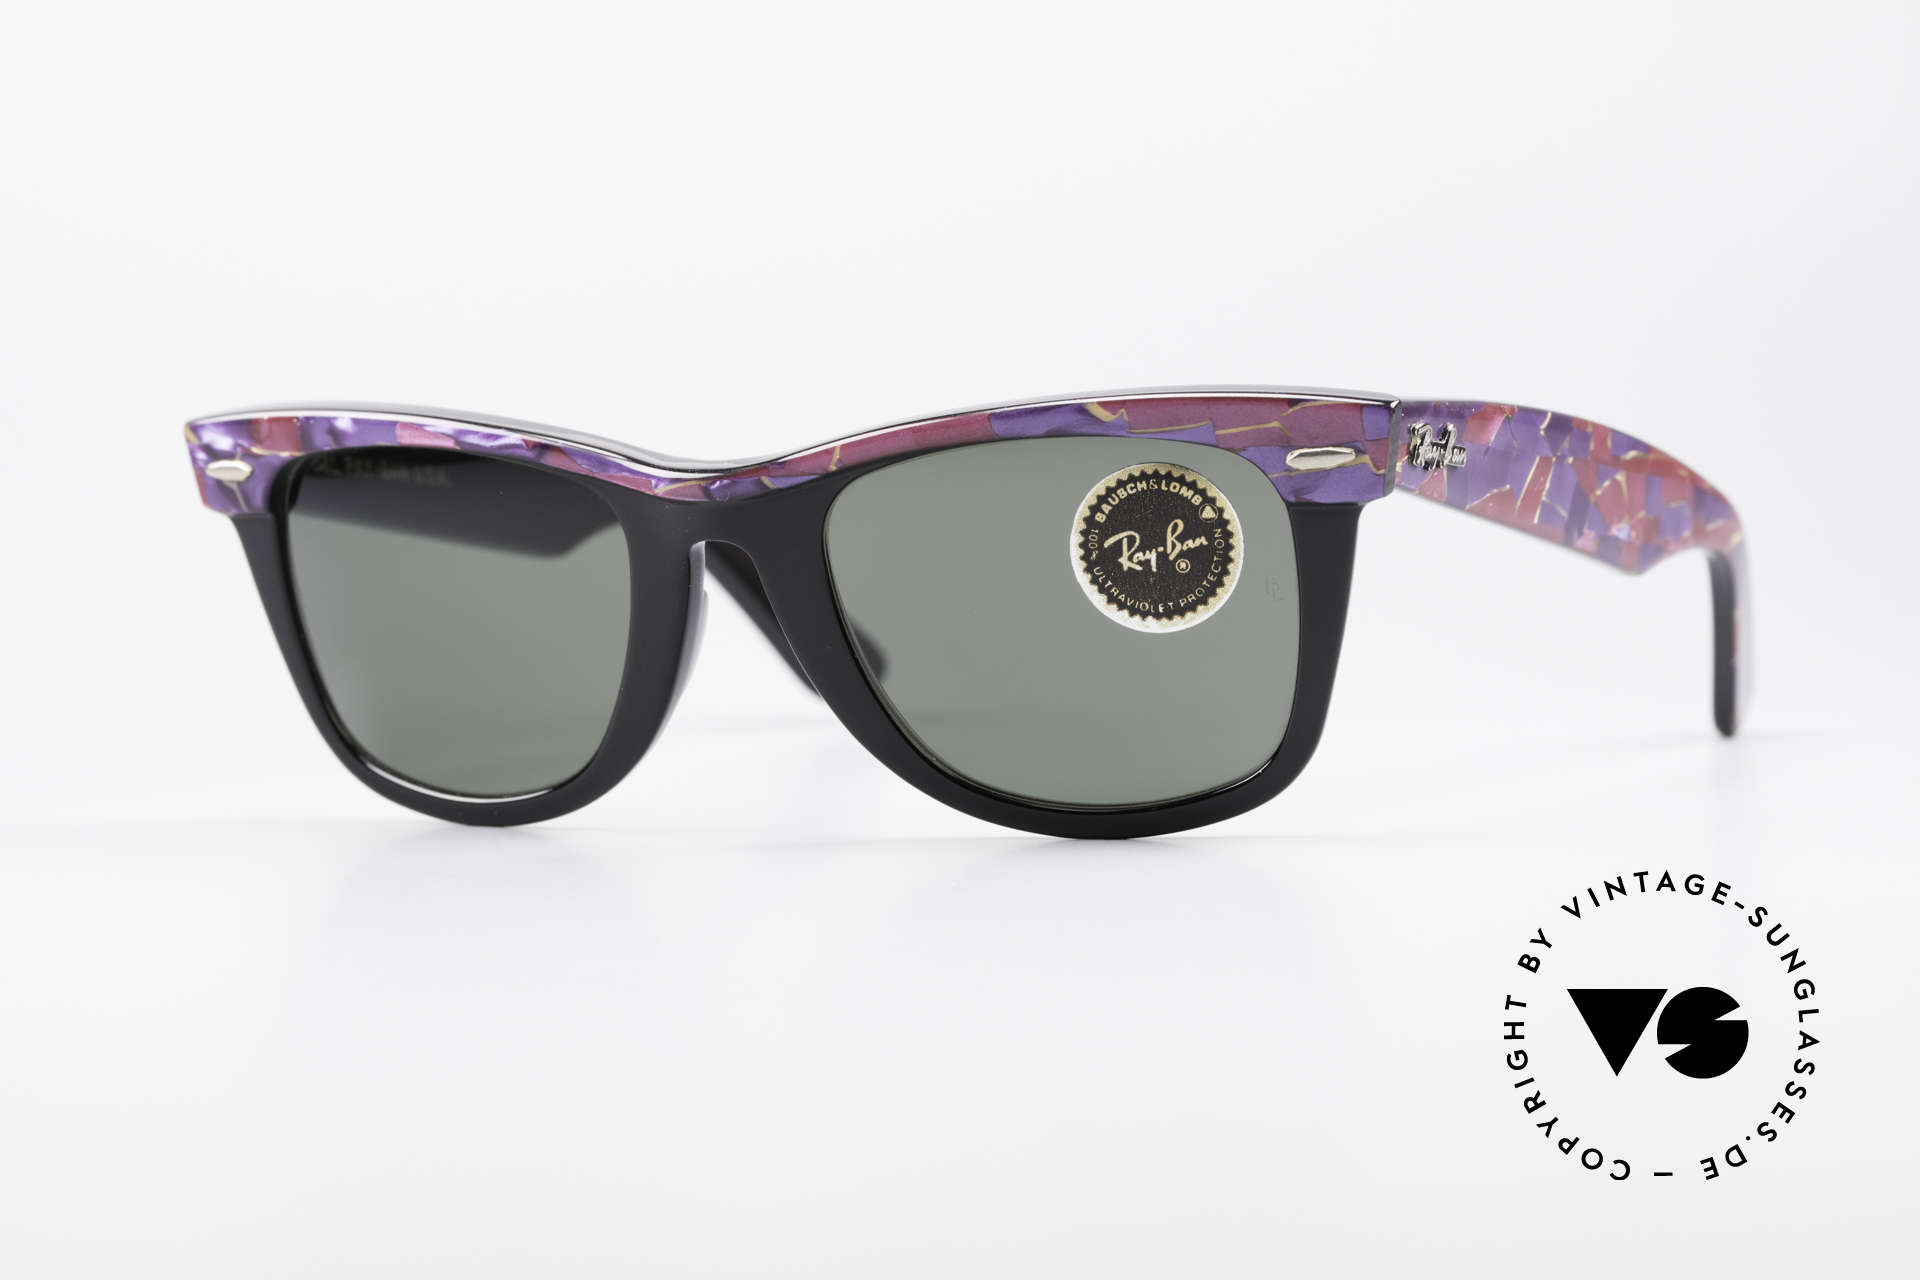 Ray Ban Wayfarer I Original Mosaic Wayfarer B&L, vintage Ray Ban Wayfarer sunglasses 'made in USA', Made for Men and Women